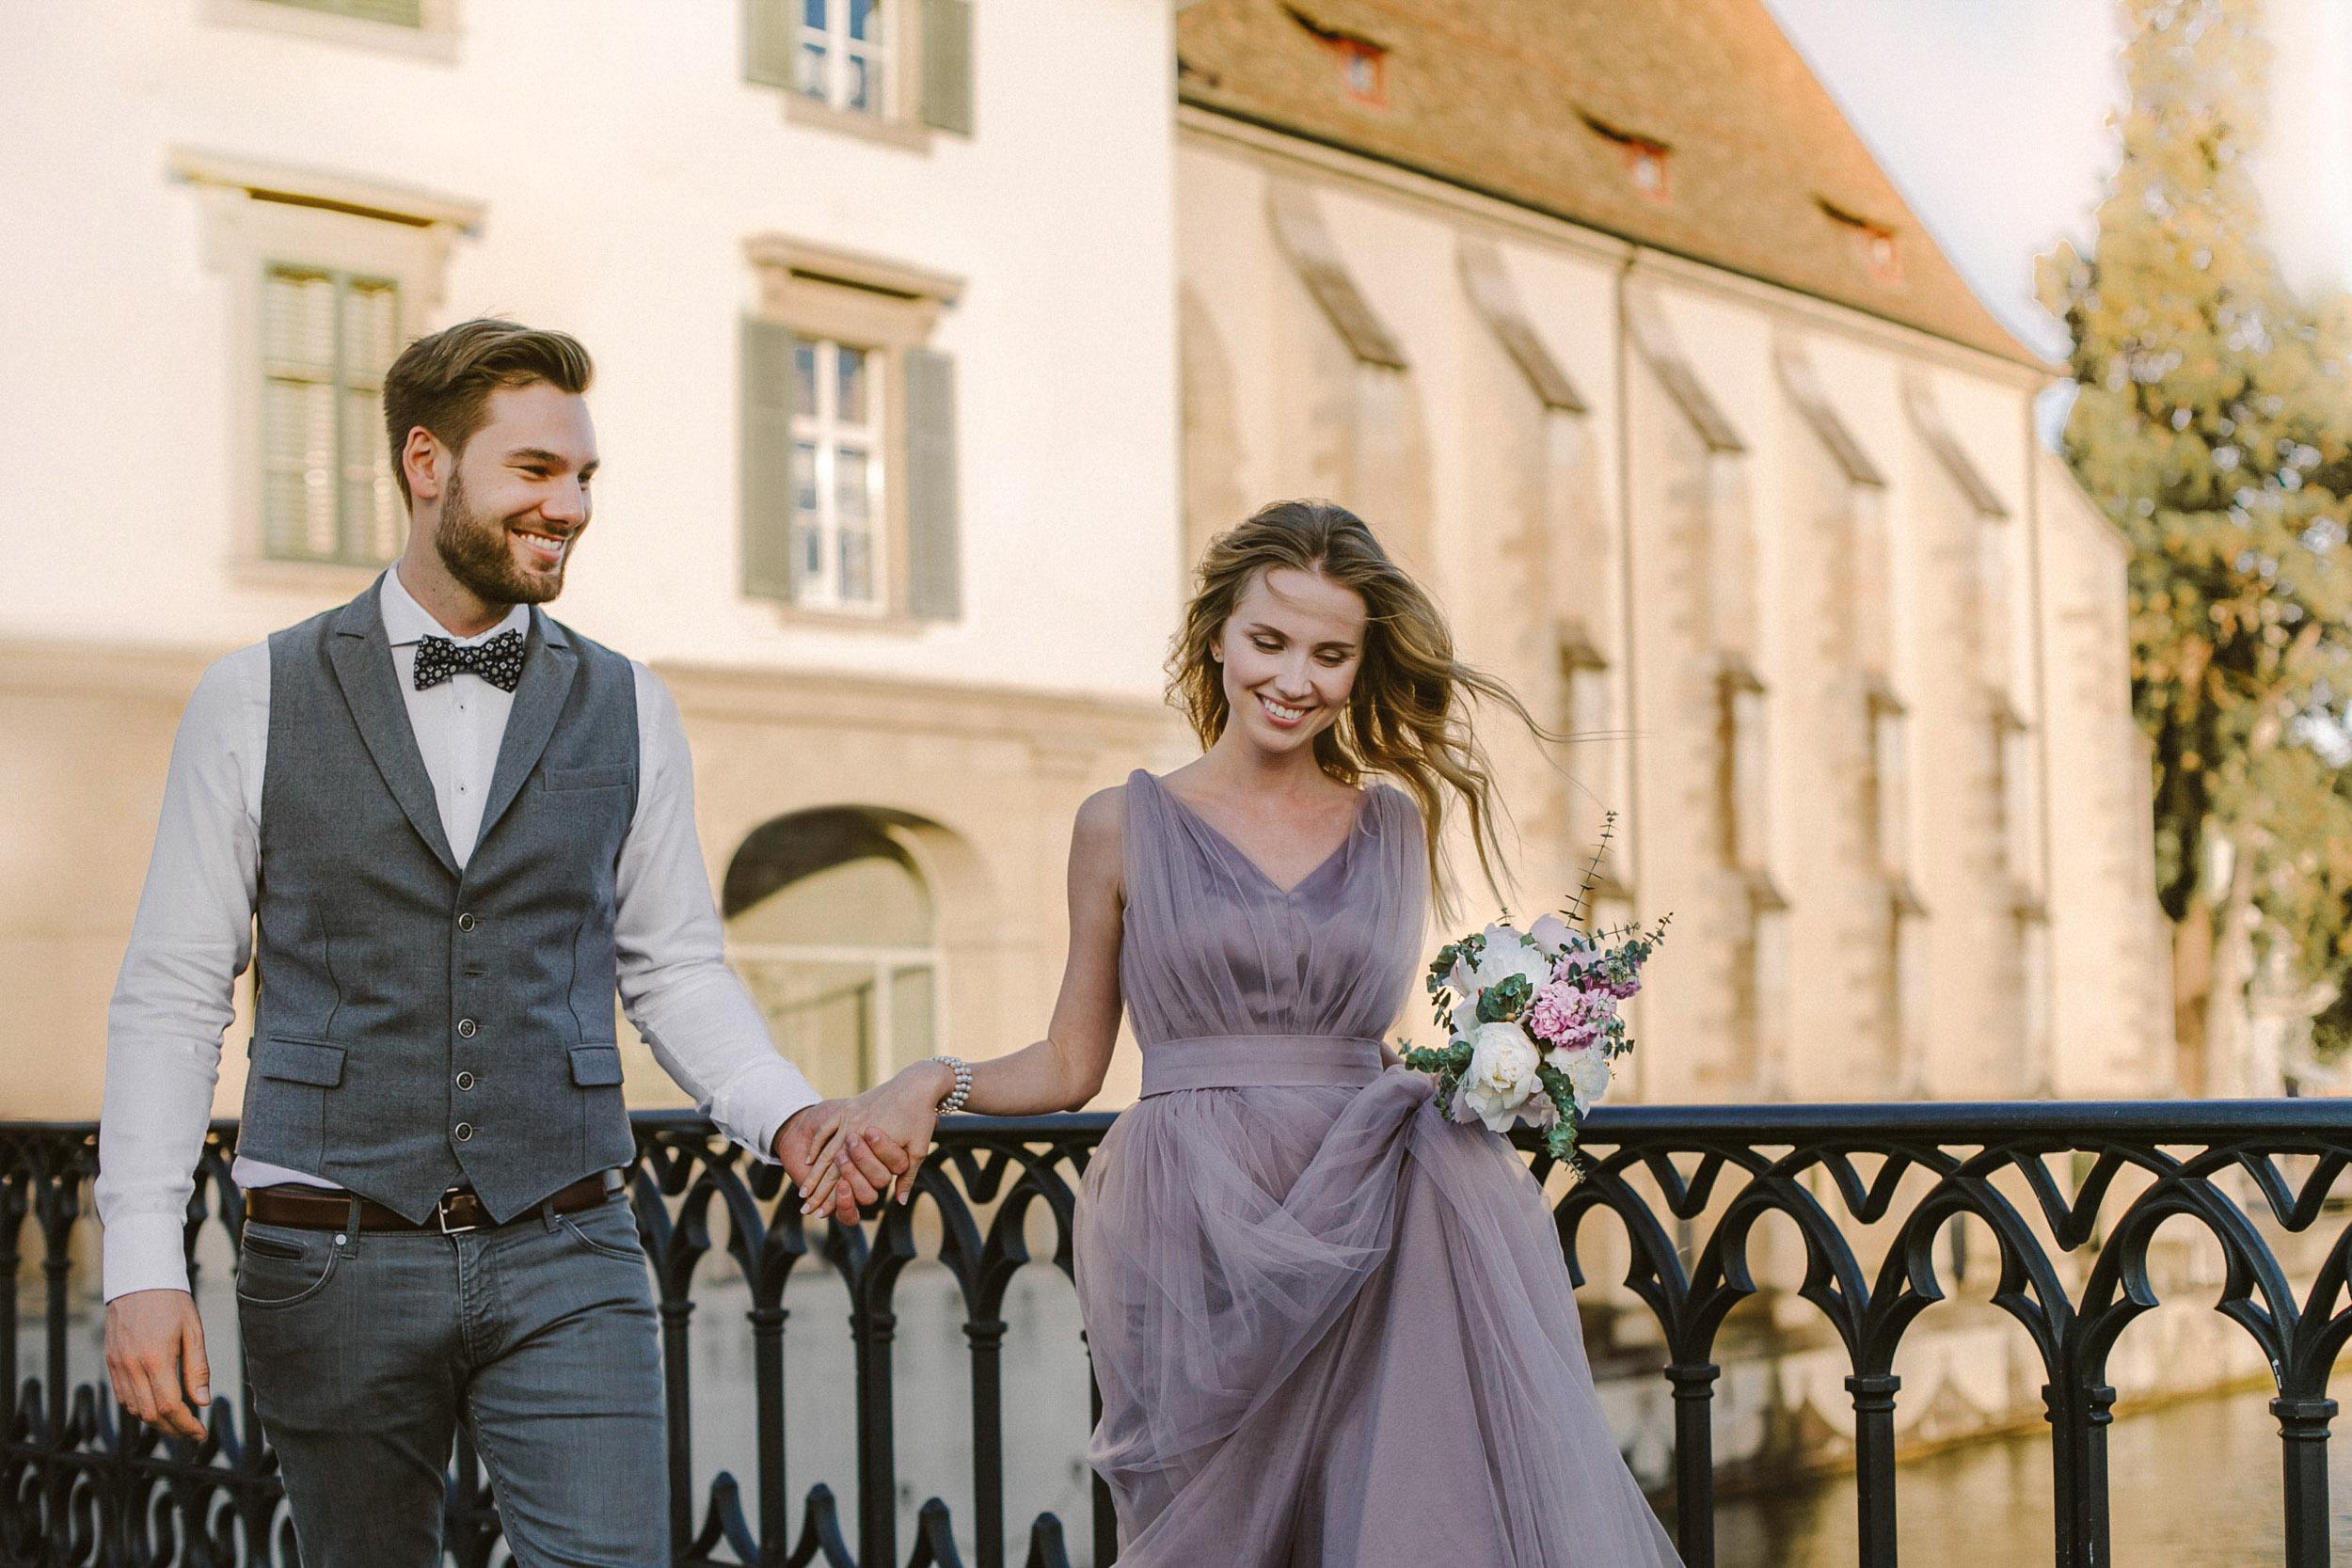 hochzeitsfotografie-schweiz_wedding-photographer-switzerland-europe_Bendik-Photography-005